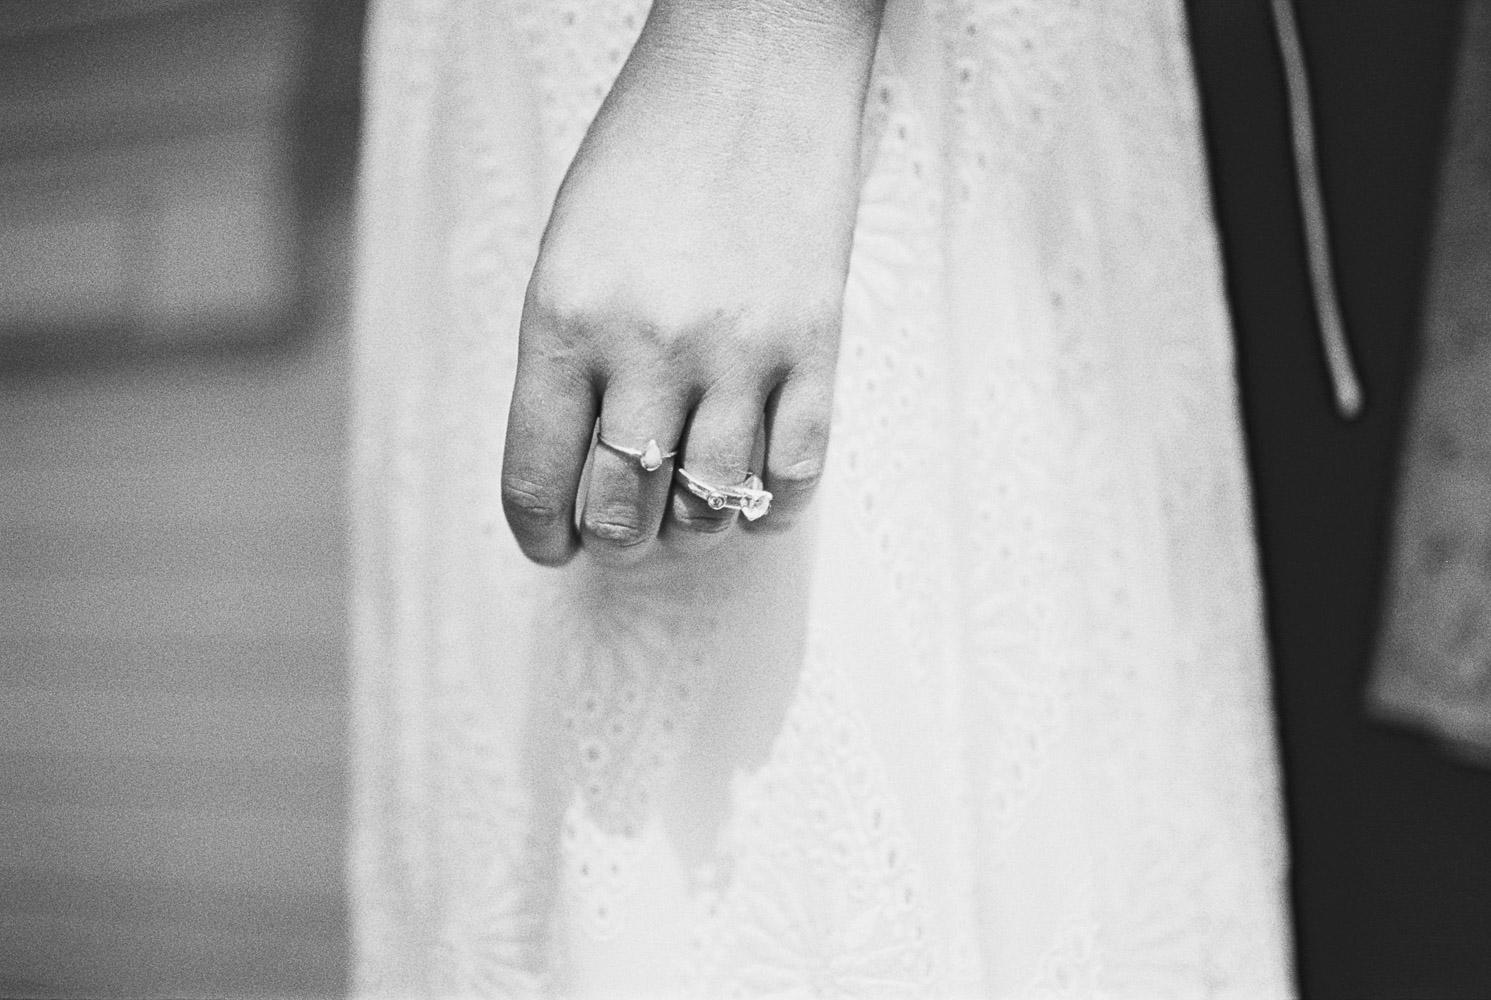 Weddings rings of Wellspring Spa Bride before ceremony near Mt Rainier